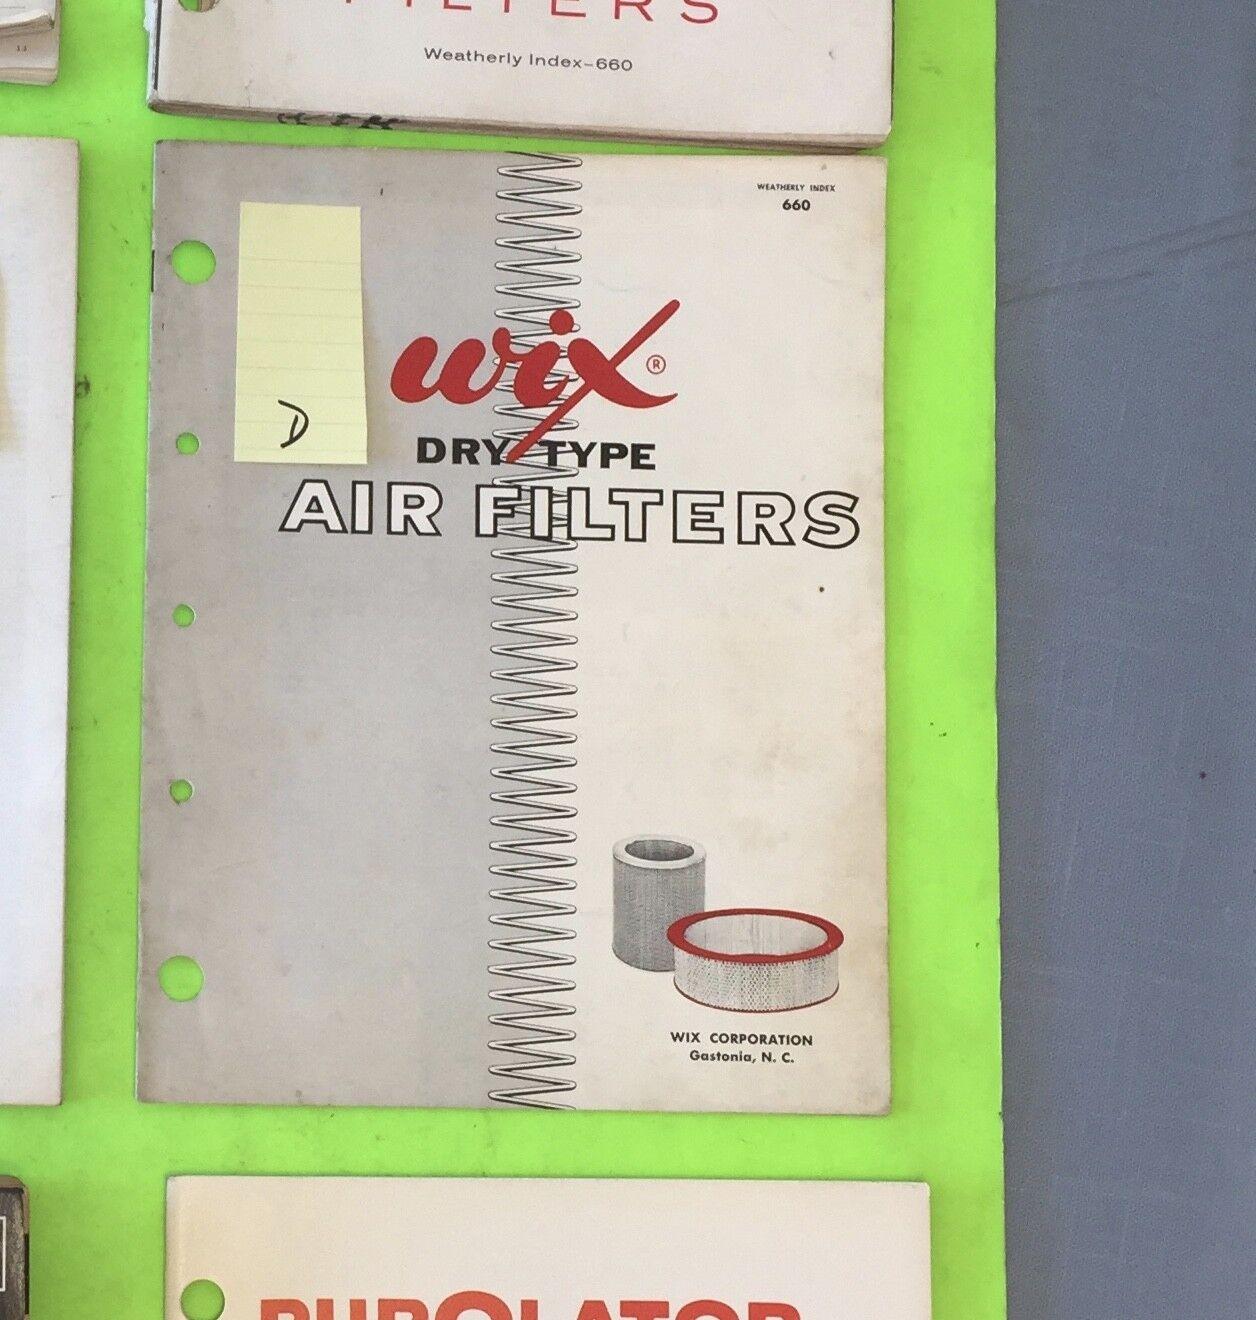 Wix air filter catalog.   Item:  9214d